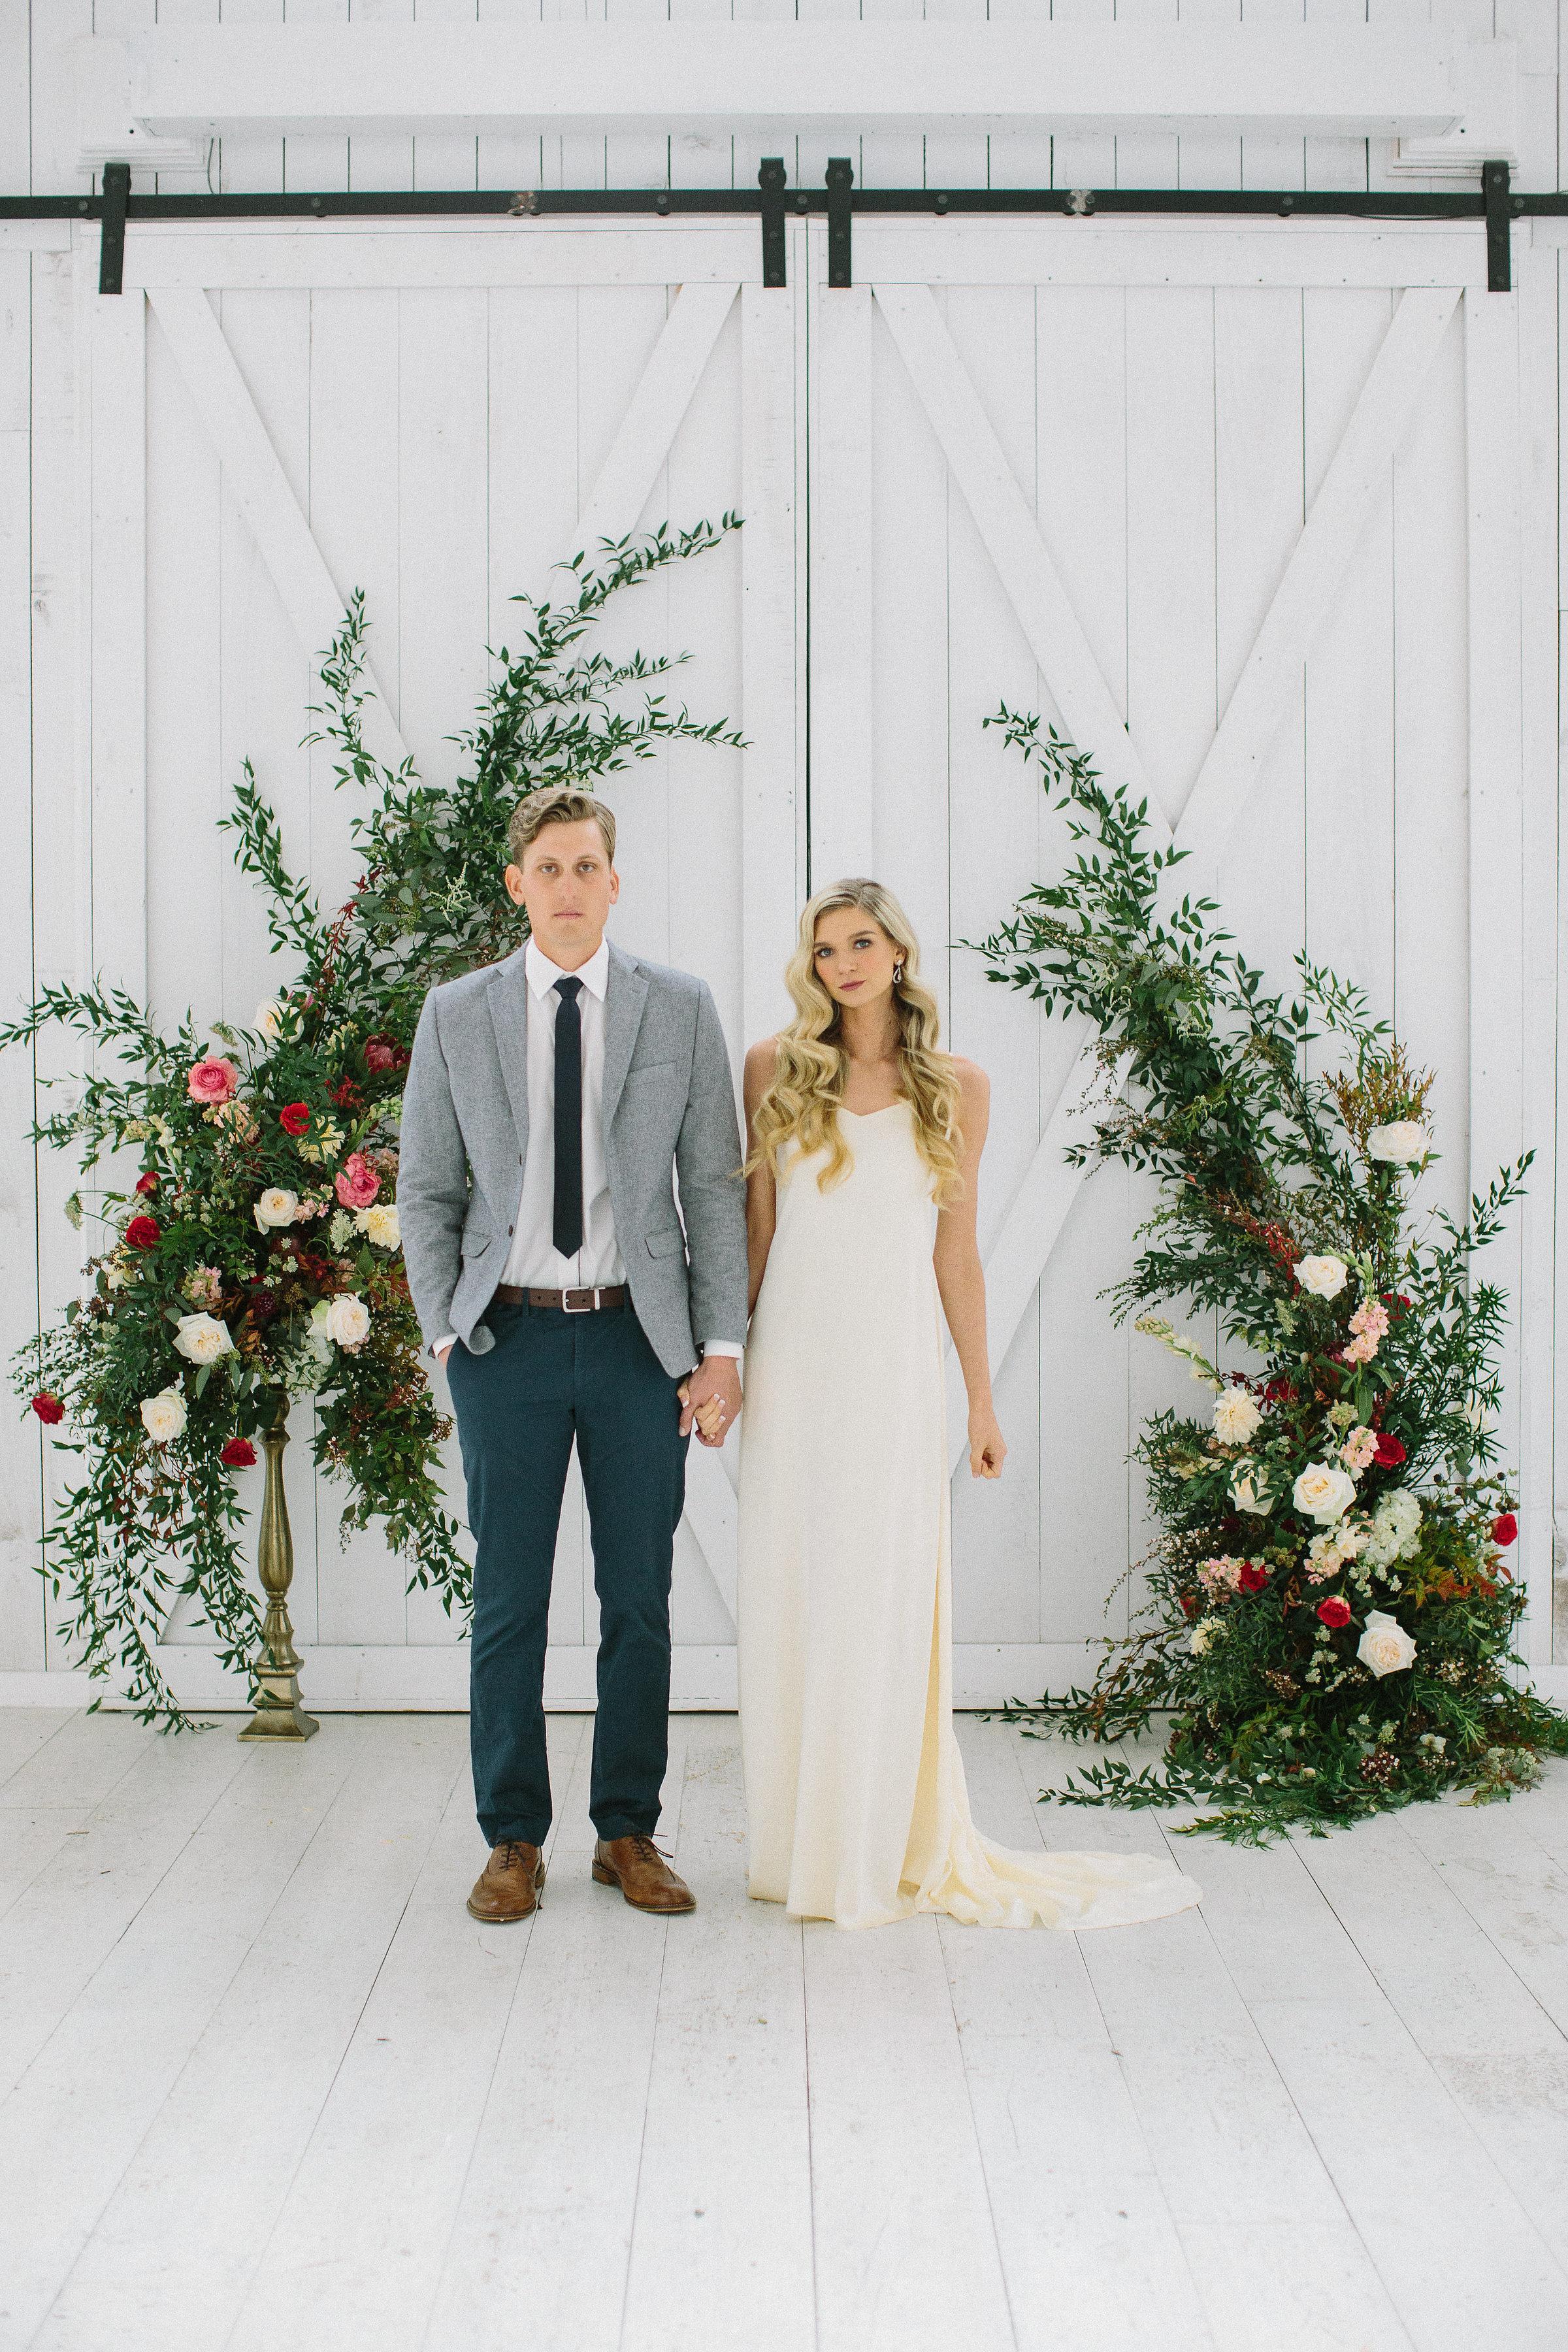 Ellen-Ashton-Photography-White-Sparrow-Weddings114.jpg